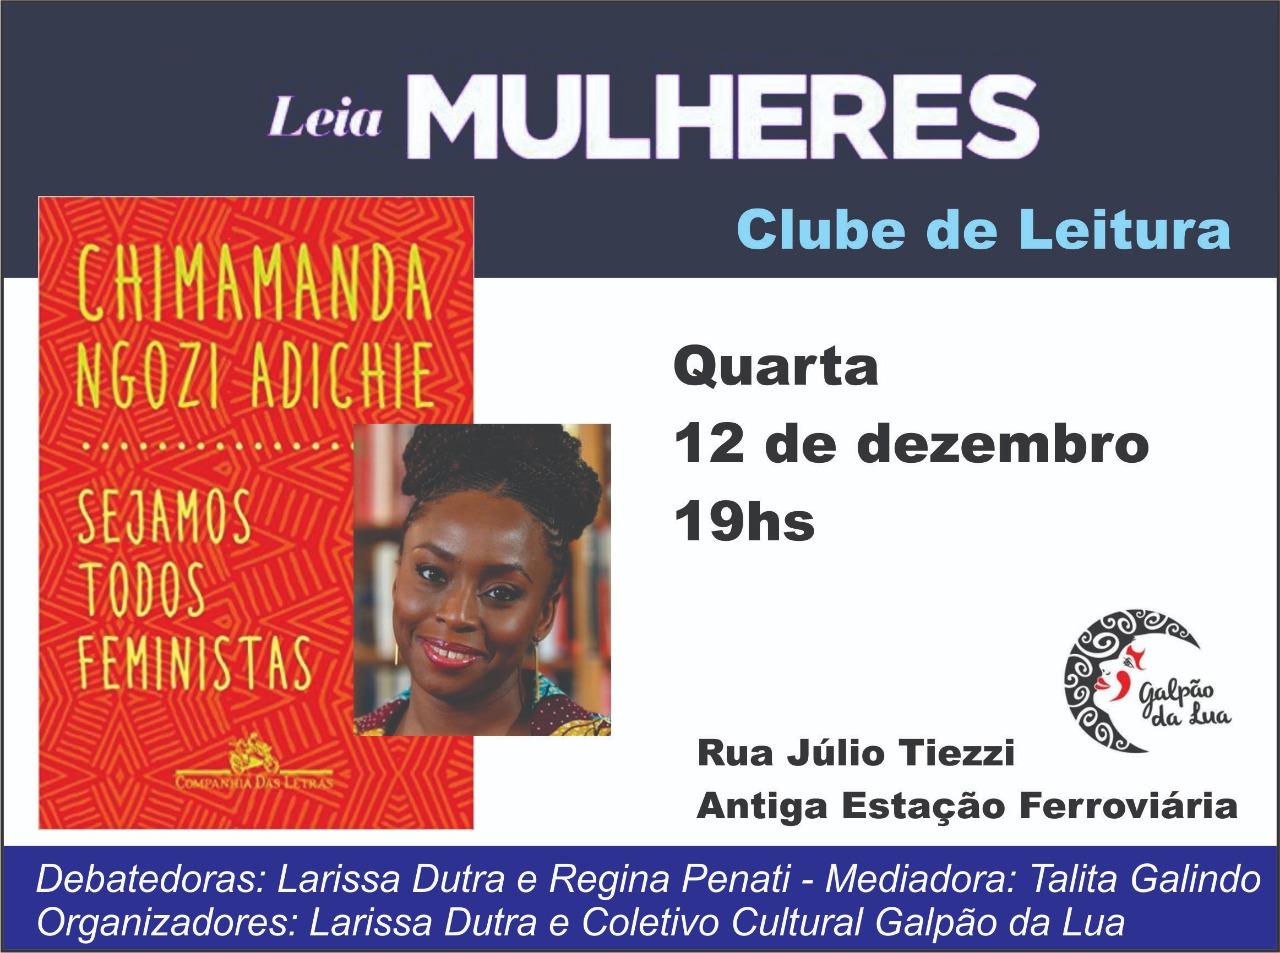 Clube de Leitura – Leia Mulheres